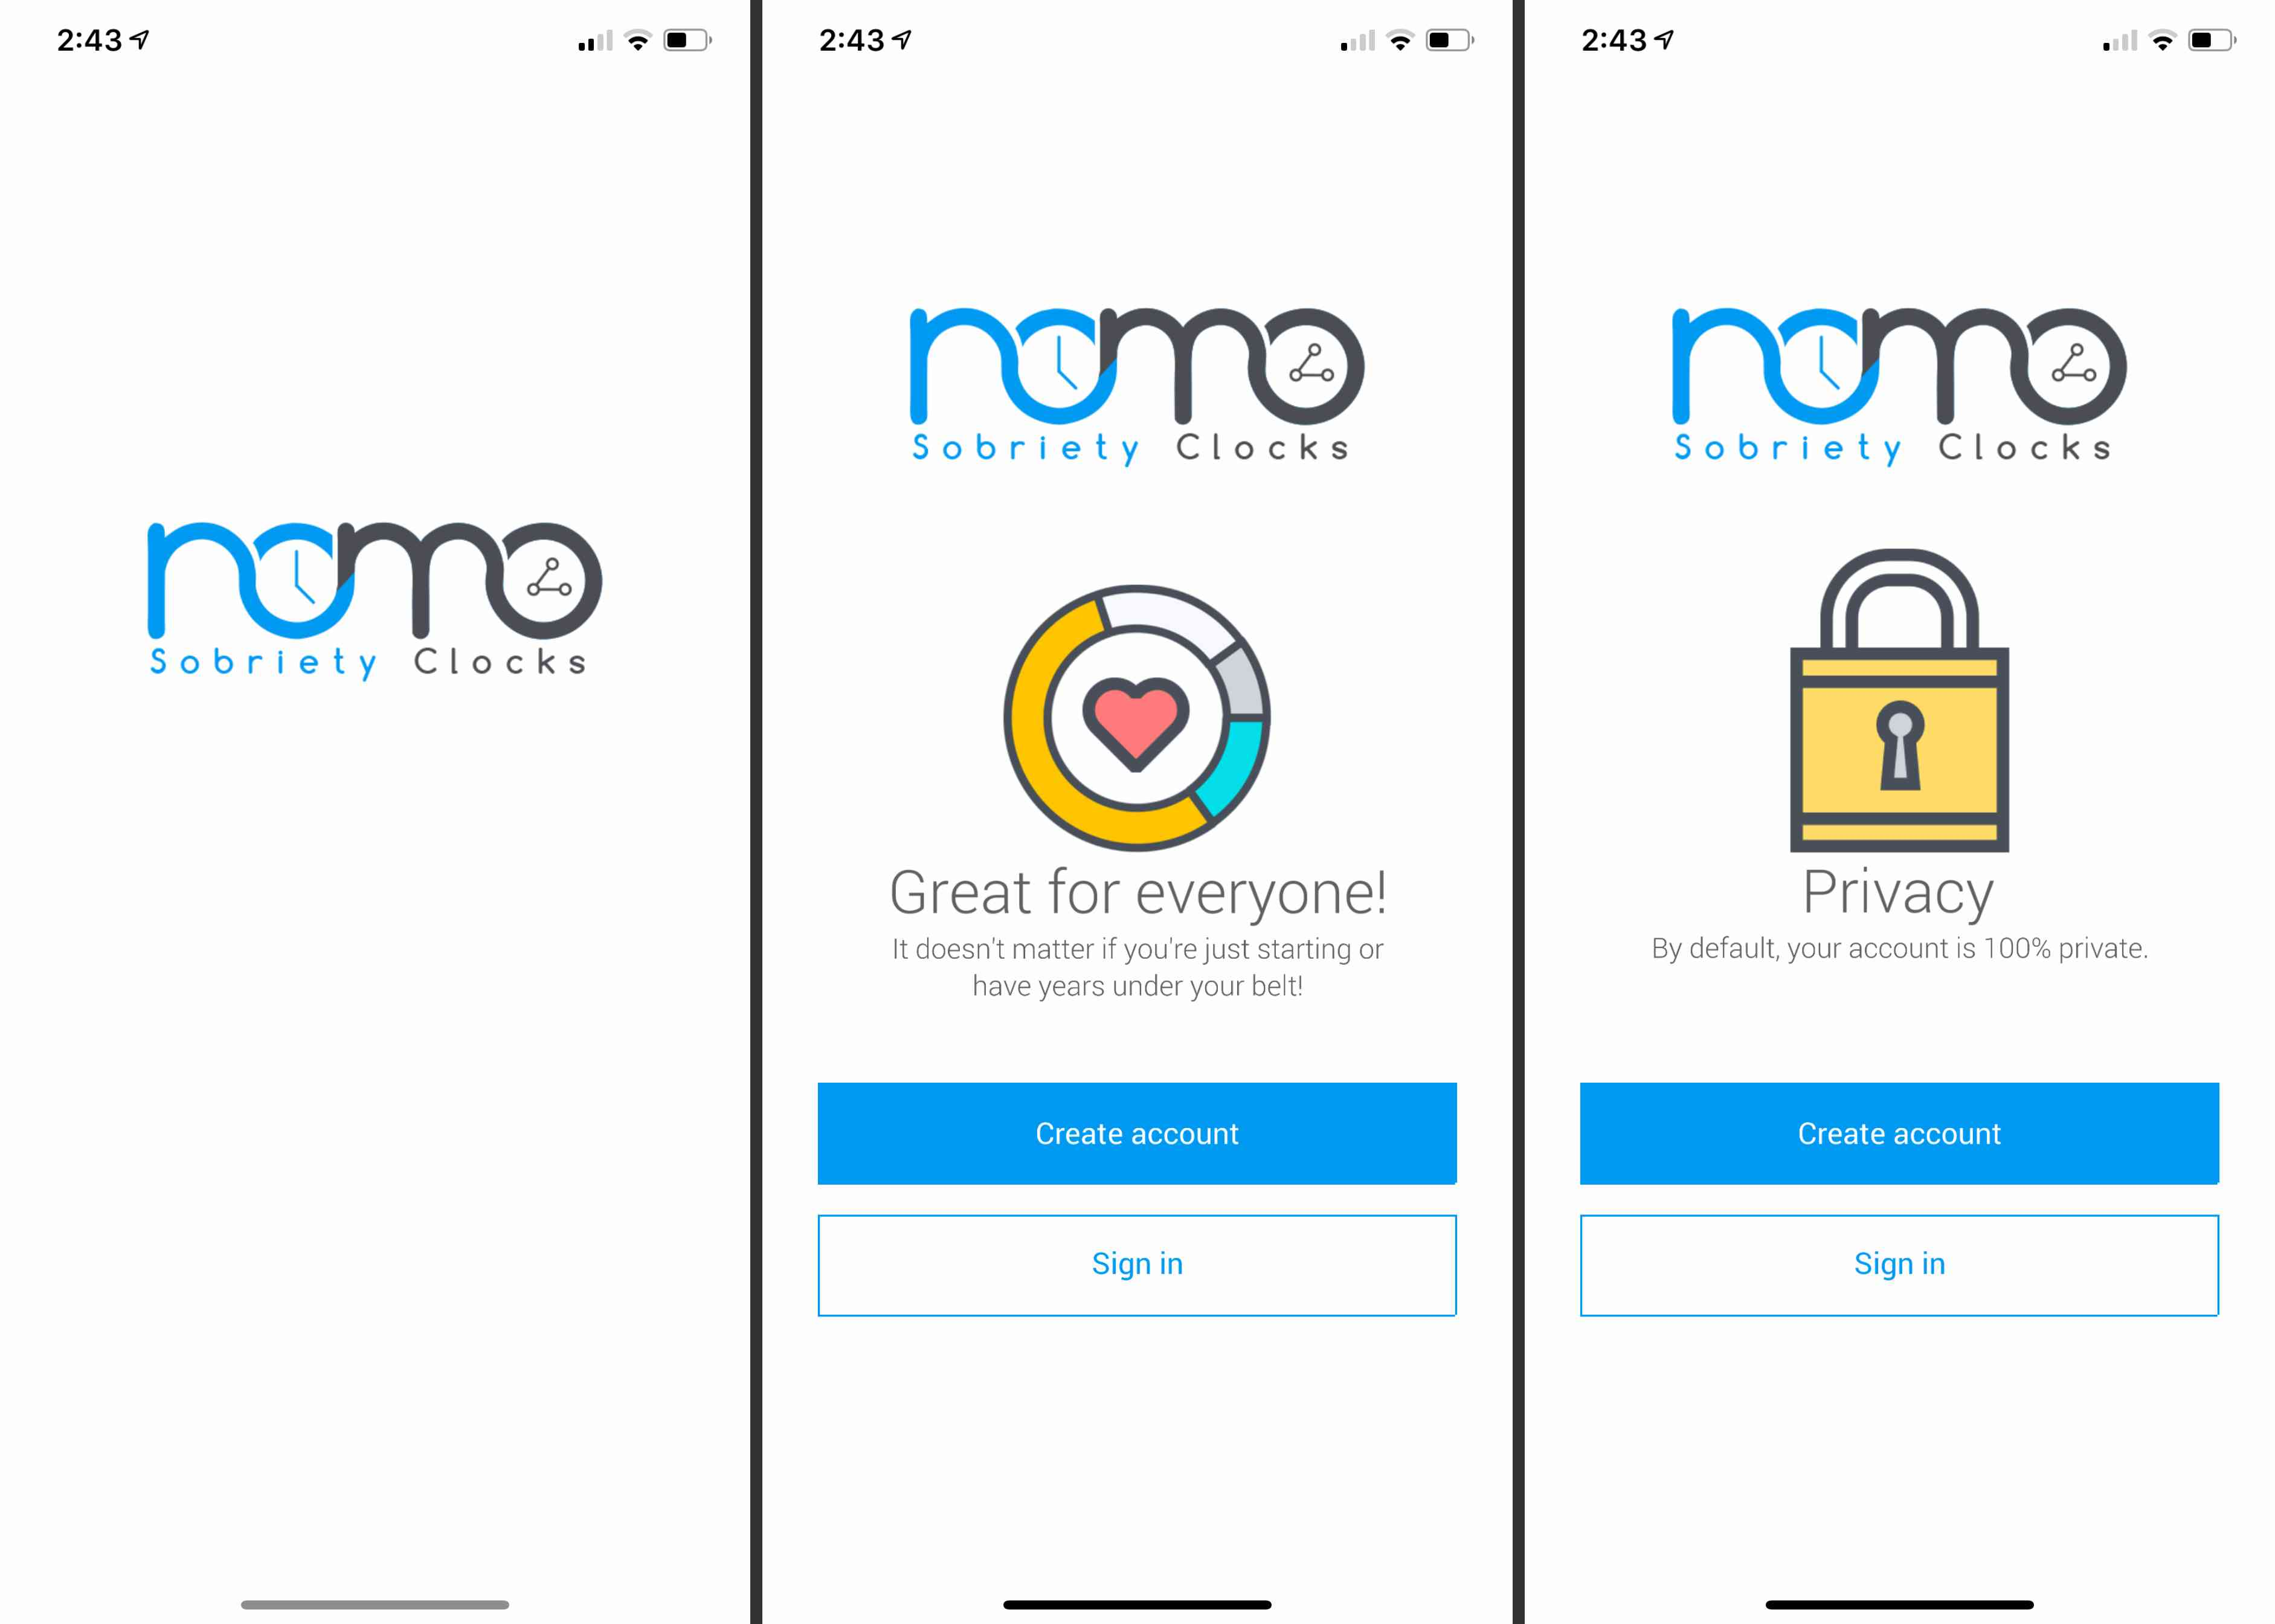 Nomo Sobriety Clocks app